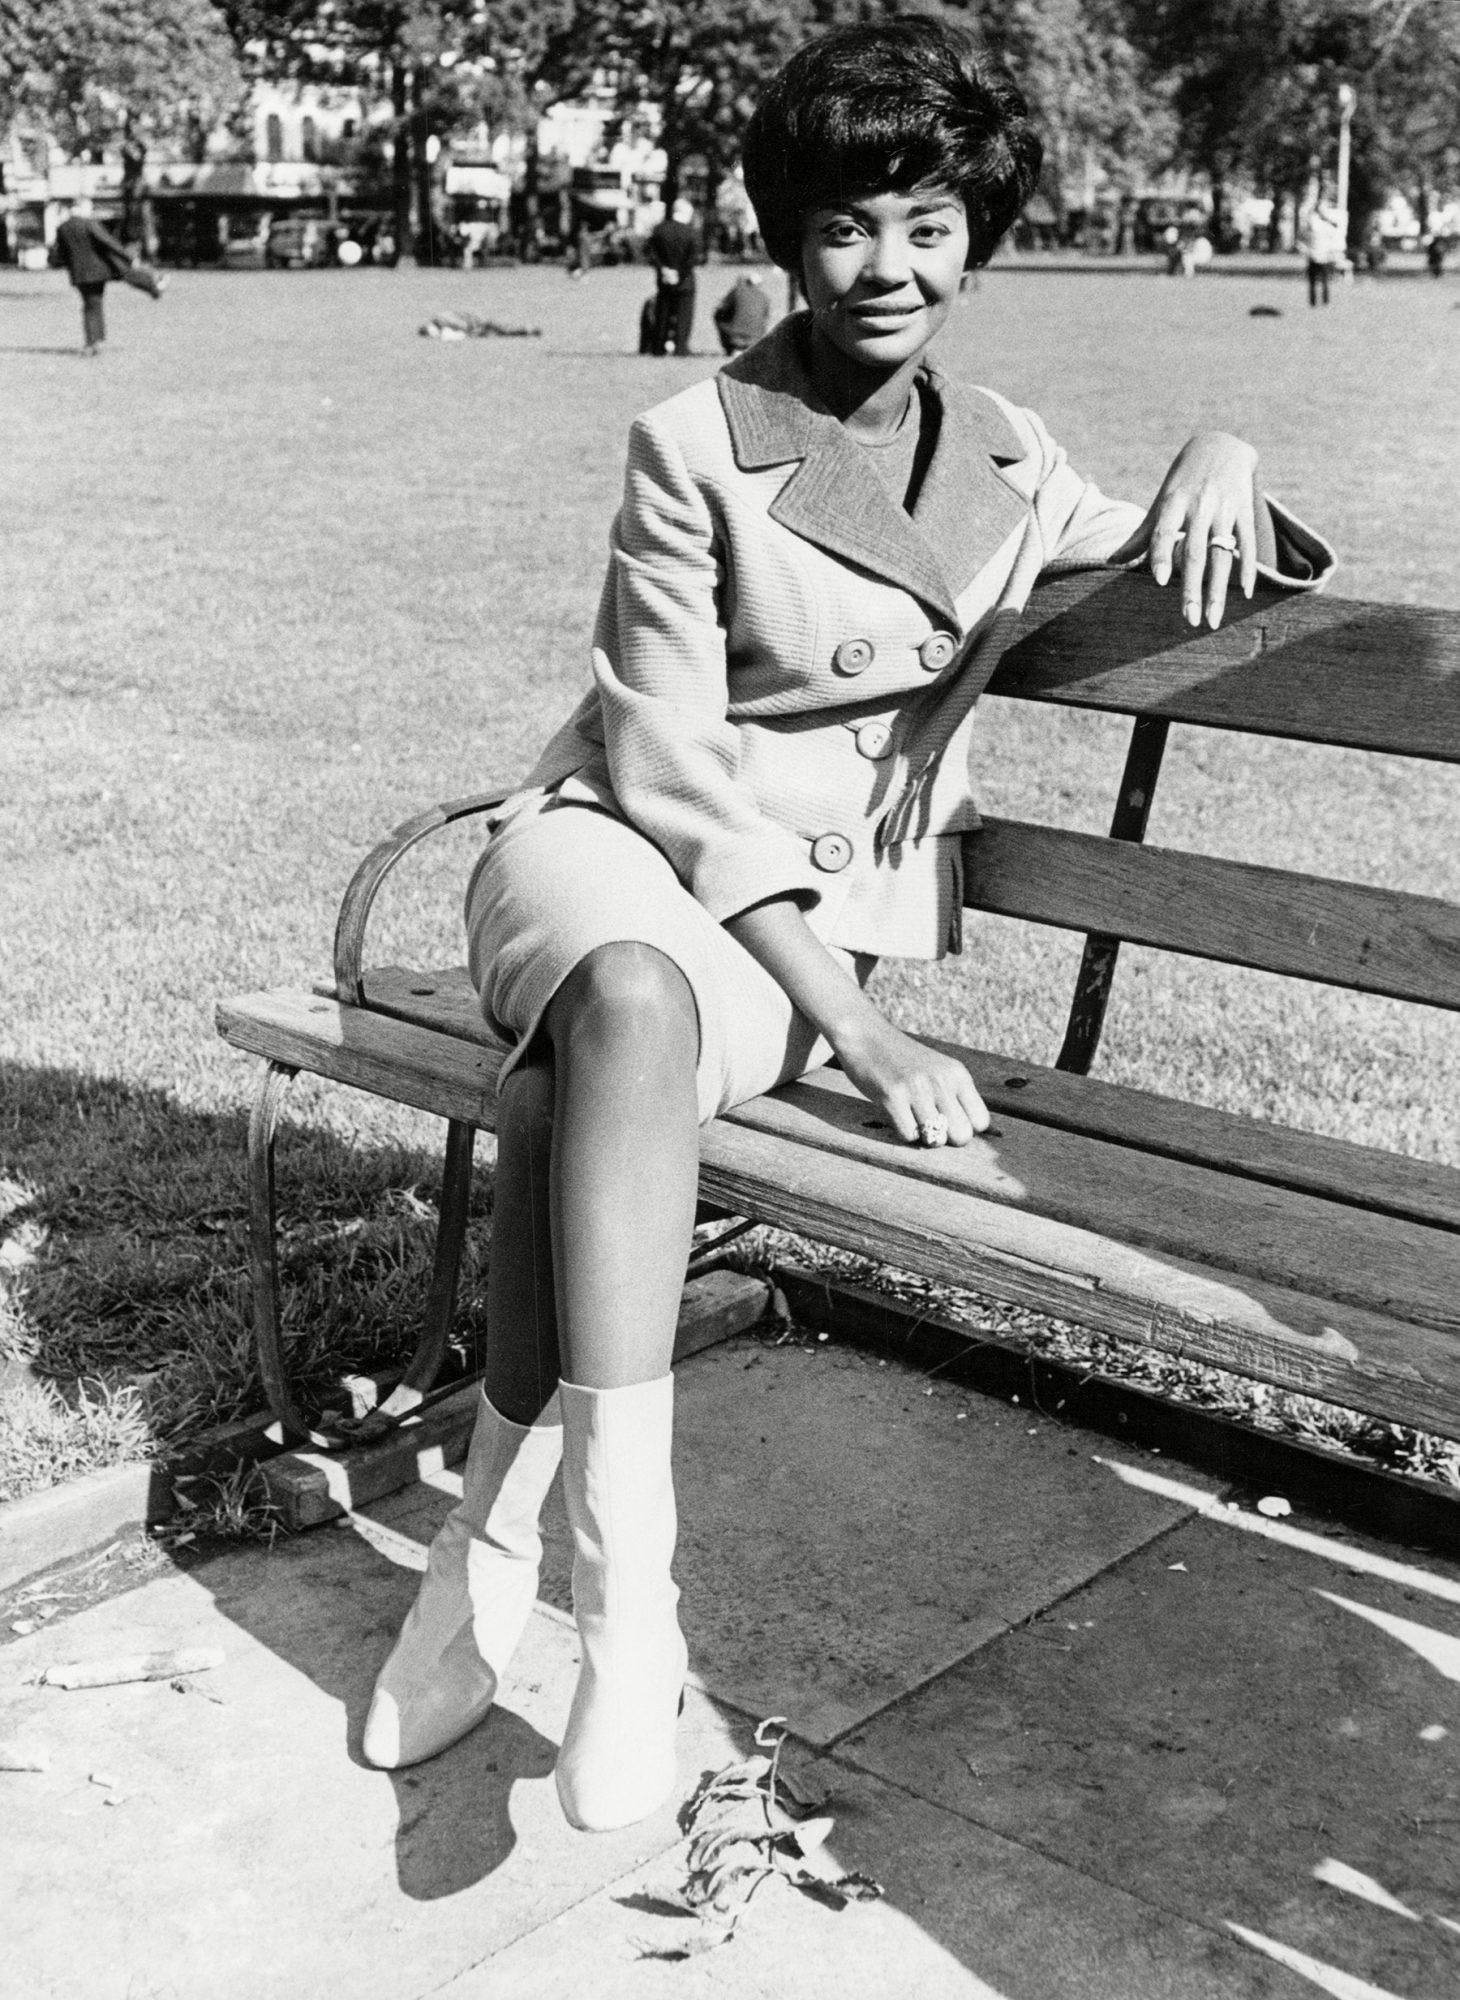 Nancy Wilson Jazz Singer On Park Bench 1965.